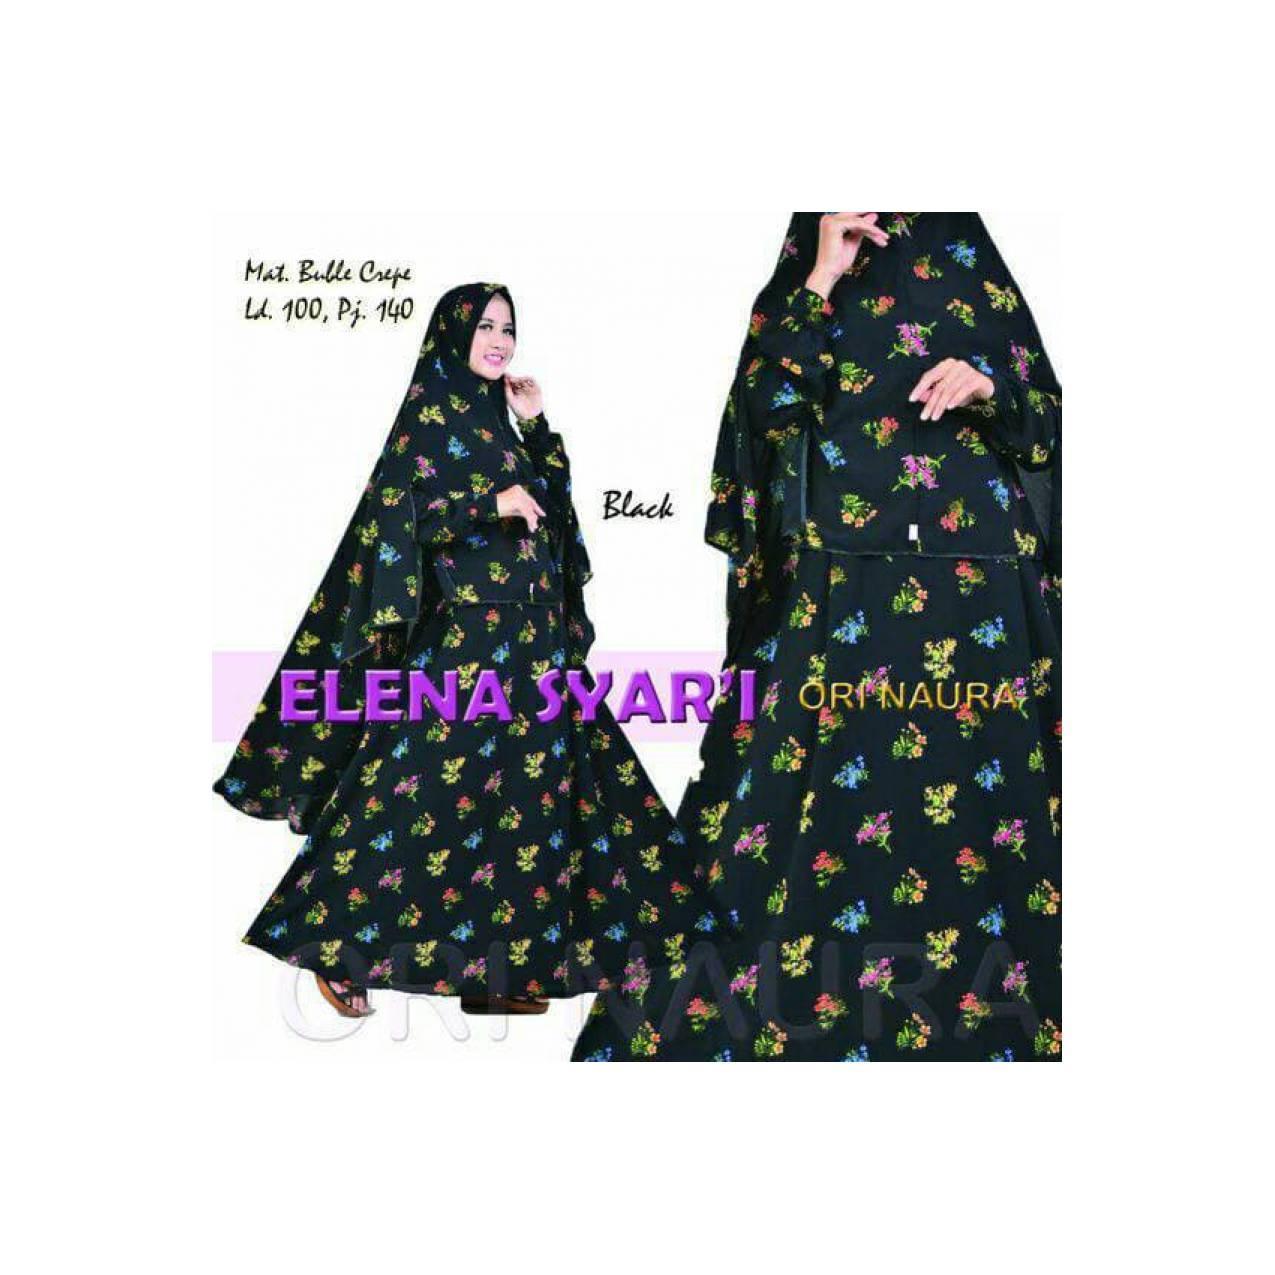 Harga Baju Muslim Syari Pria Terbaru November 2018 Blog Gado Koko Syarii Busana Wanita Gamis Abaya Motif Cantik